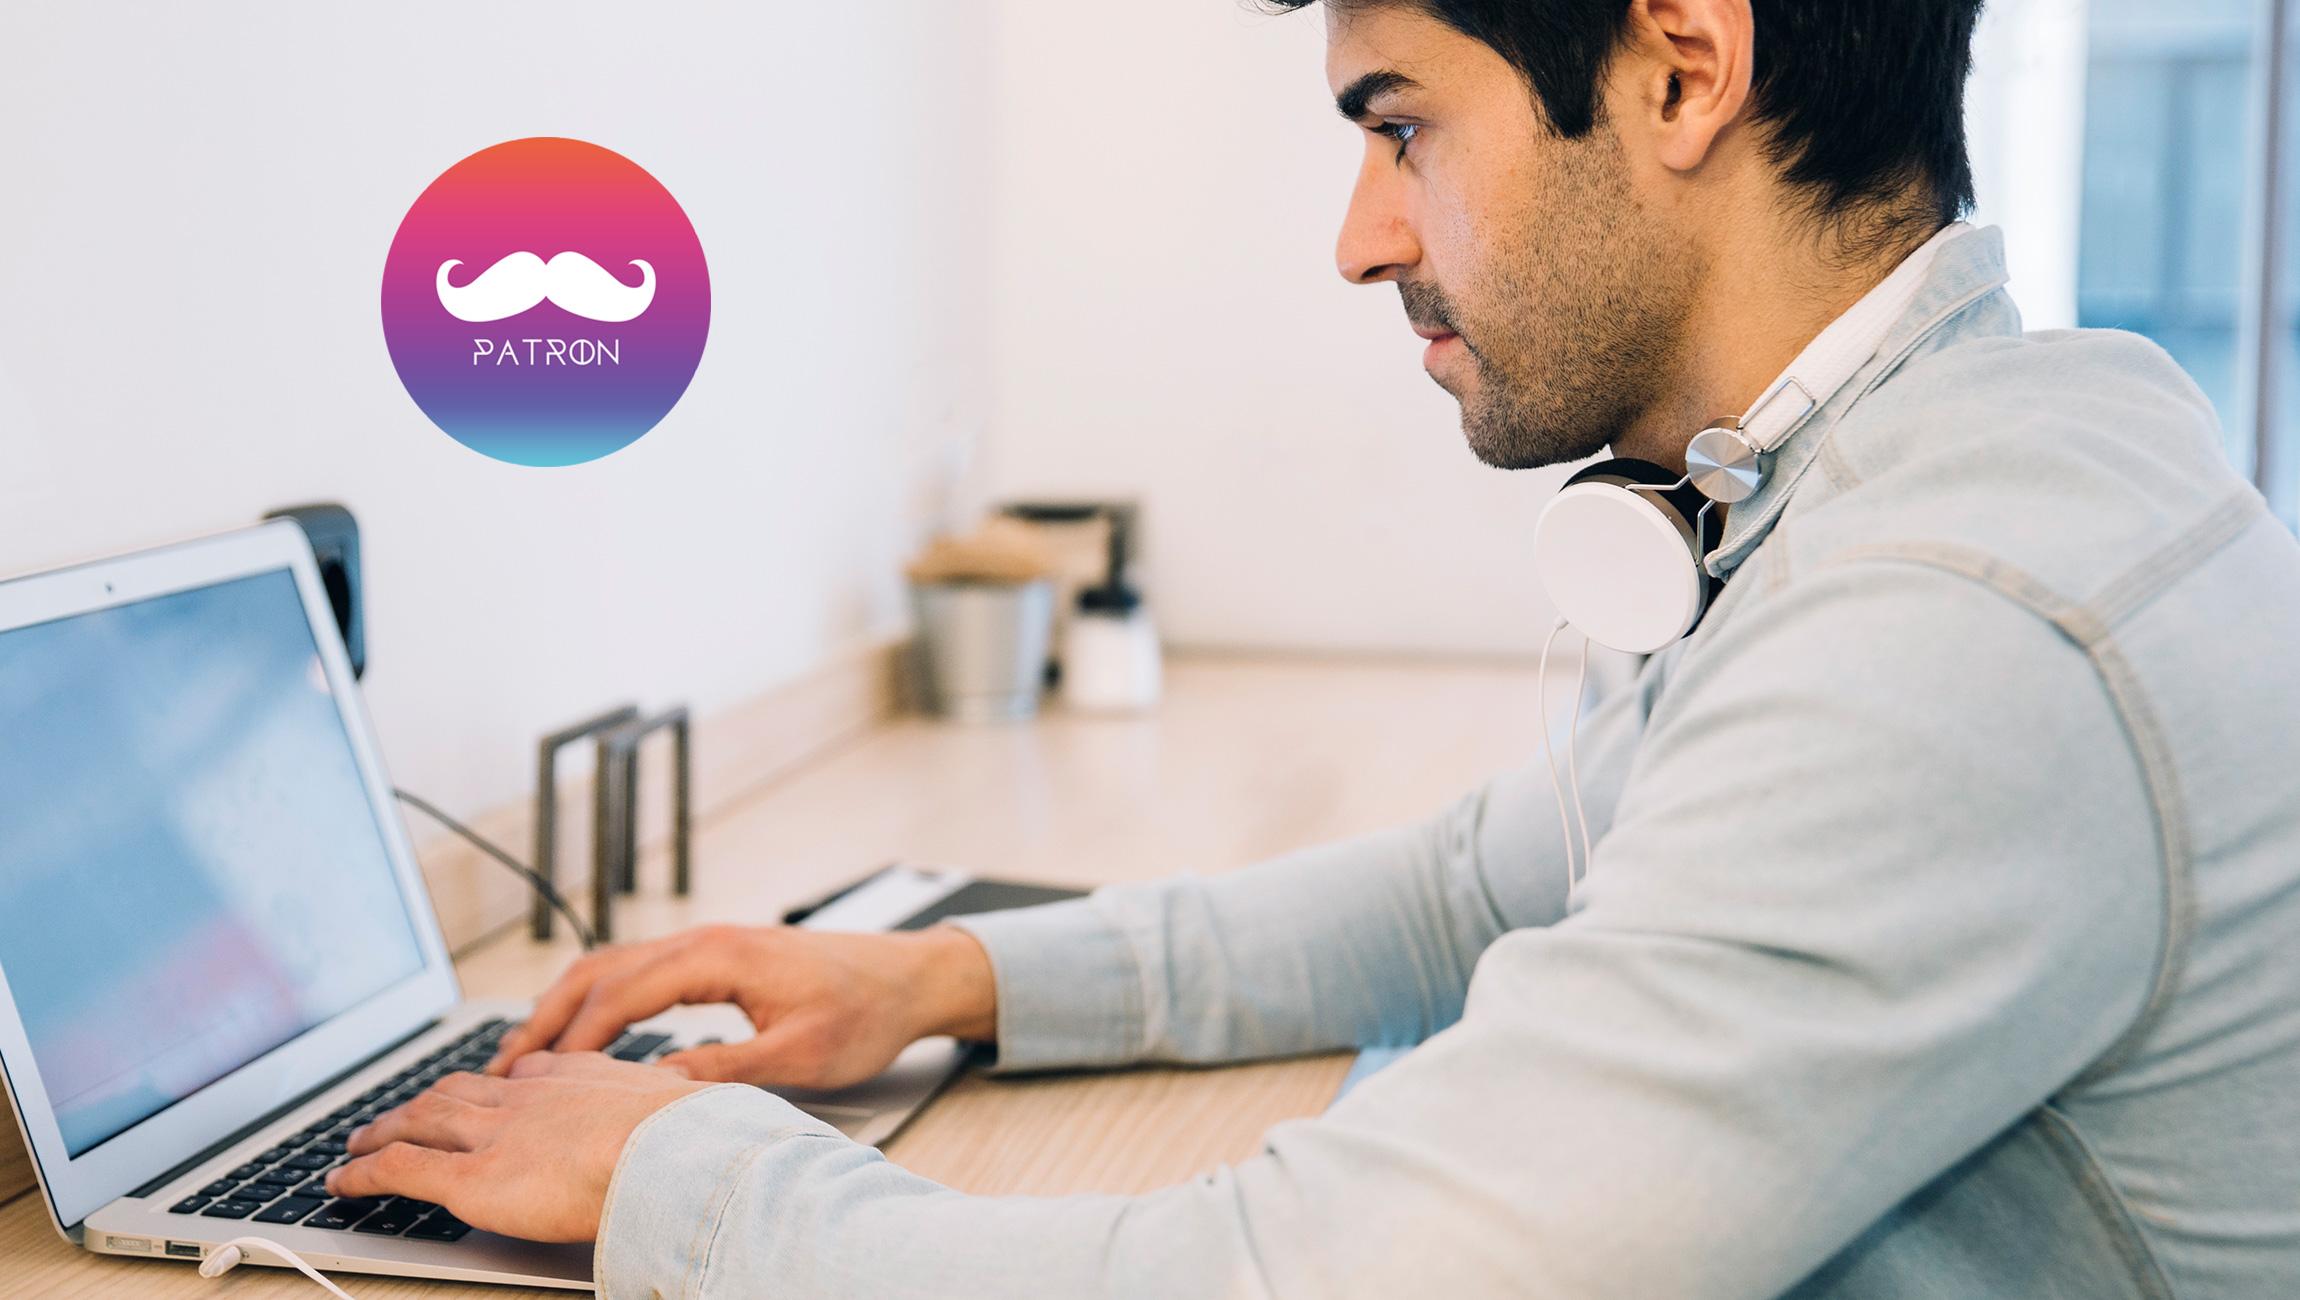 How PATRON Is Revolutionizing Social Media Marketing With Blockchain